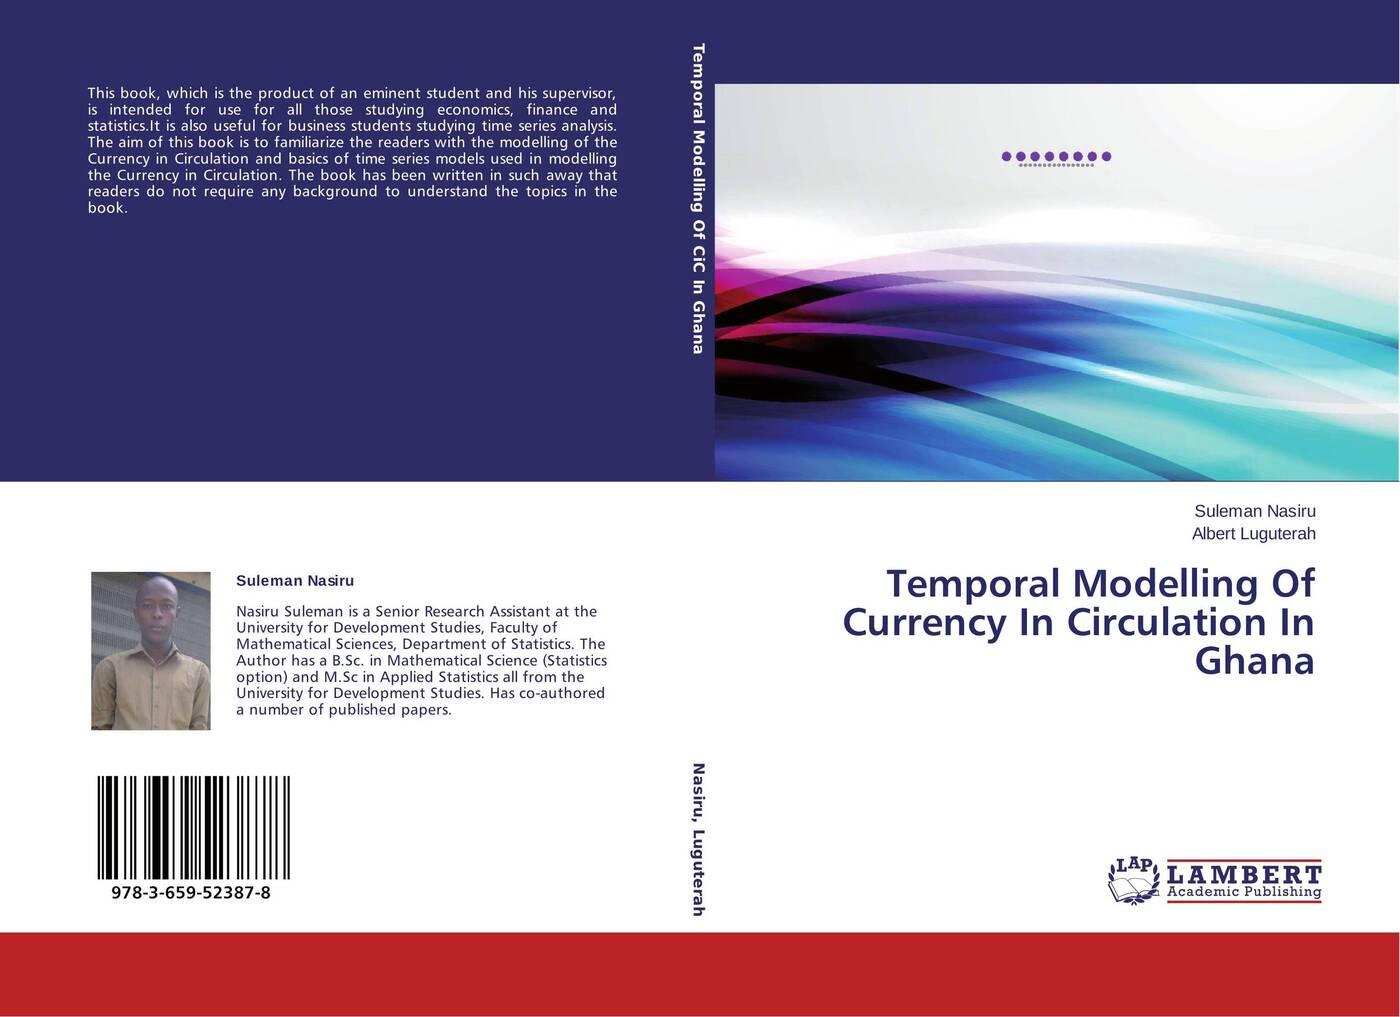 цены Suleman Nasiru and Albert Luguterah Temporal Modelling Of Currency In Circulation In Ghana